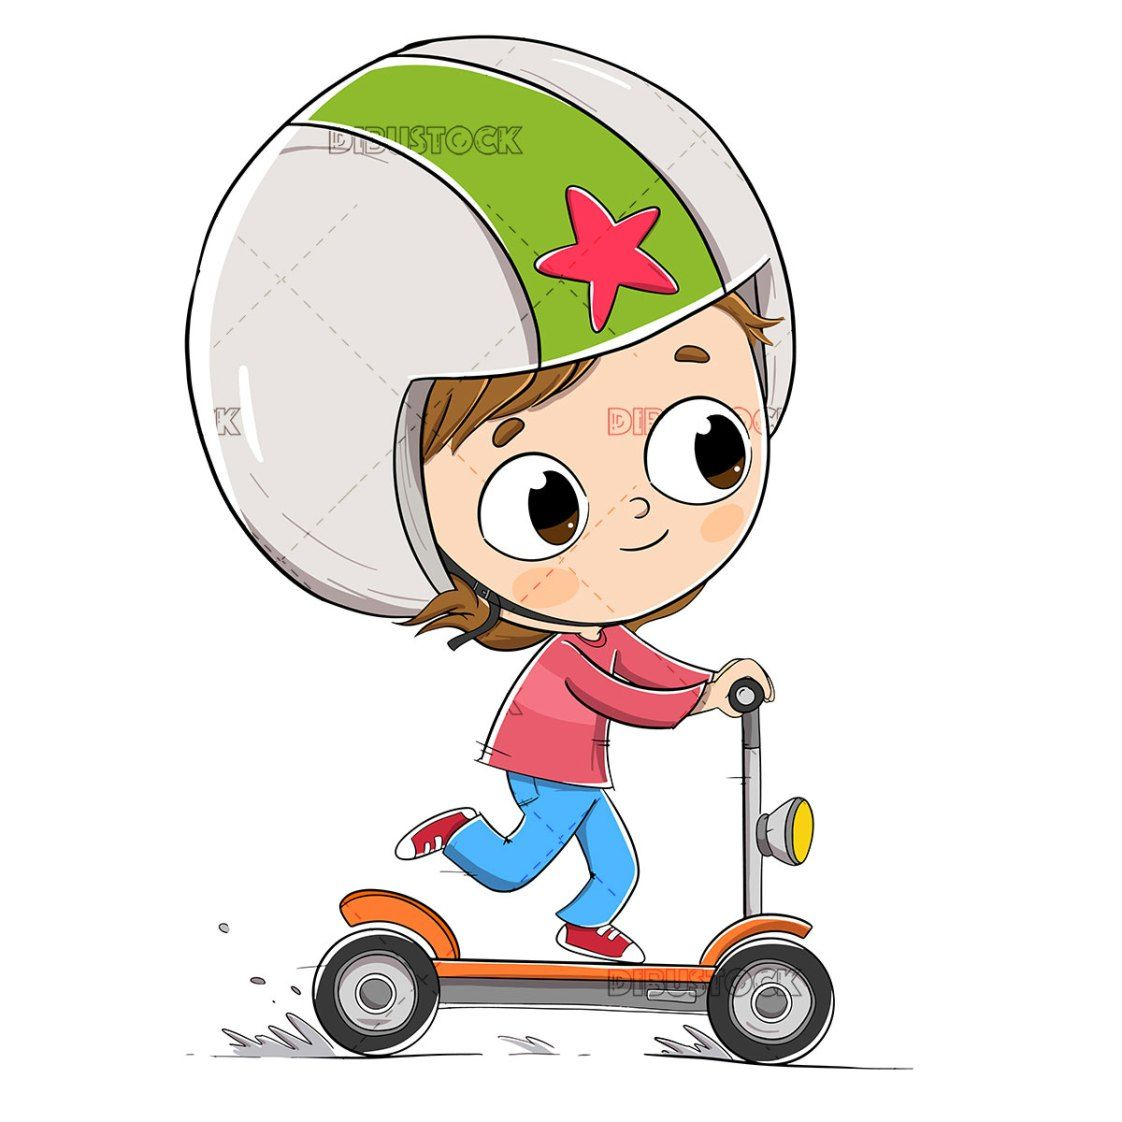 Sports And Games Dibustock Ilustraciones Infantiles De Stock Caricaturas De Ninos Ilustraciones Ilustraciones Infantiles